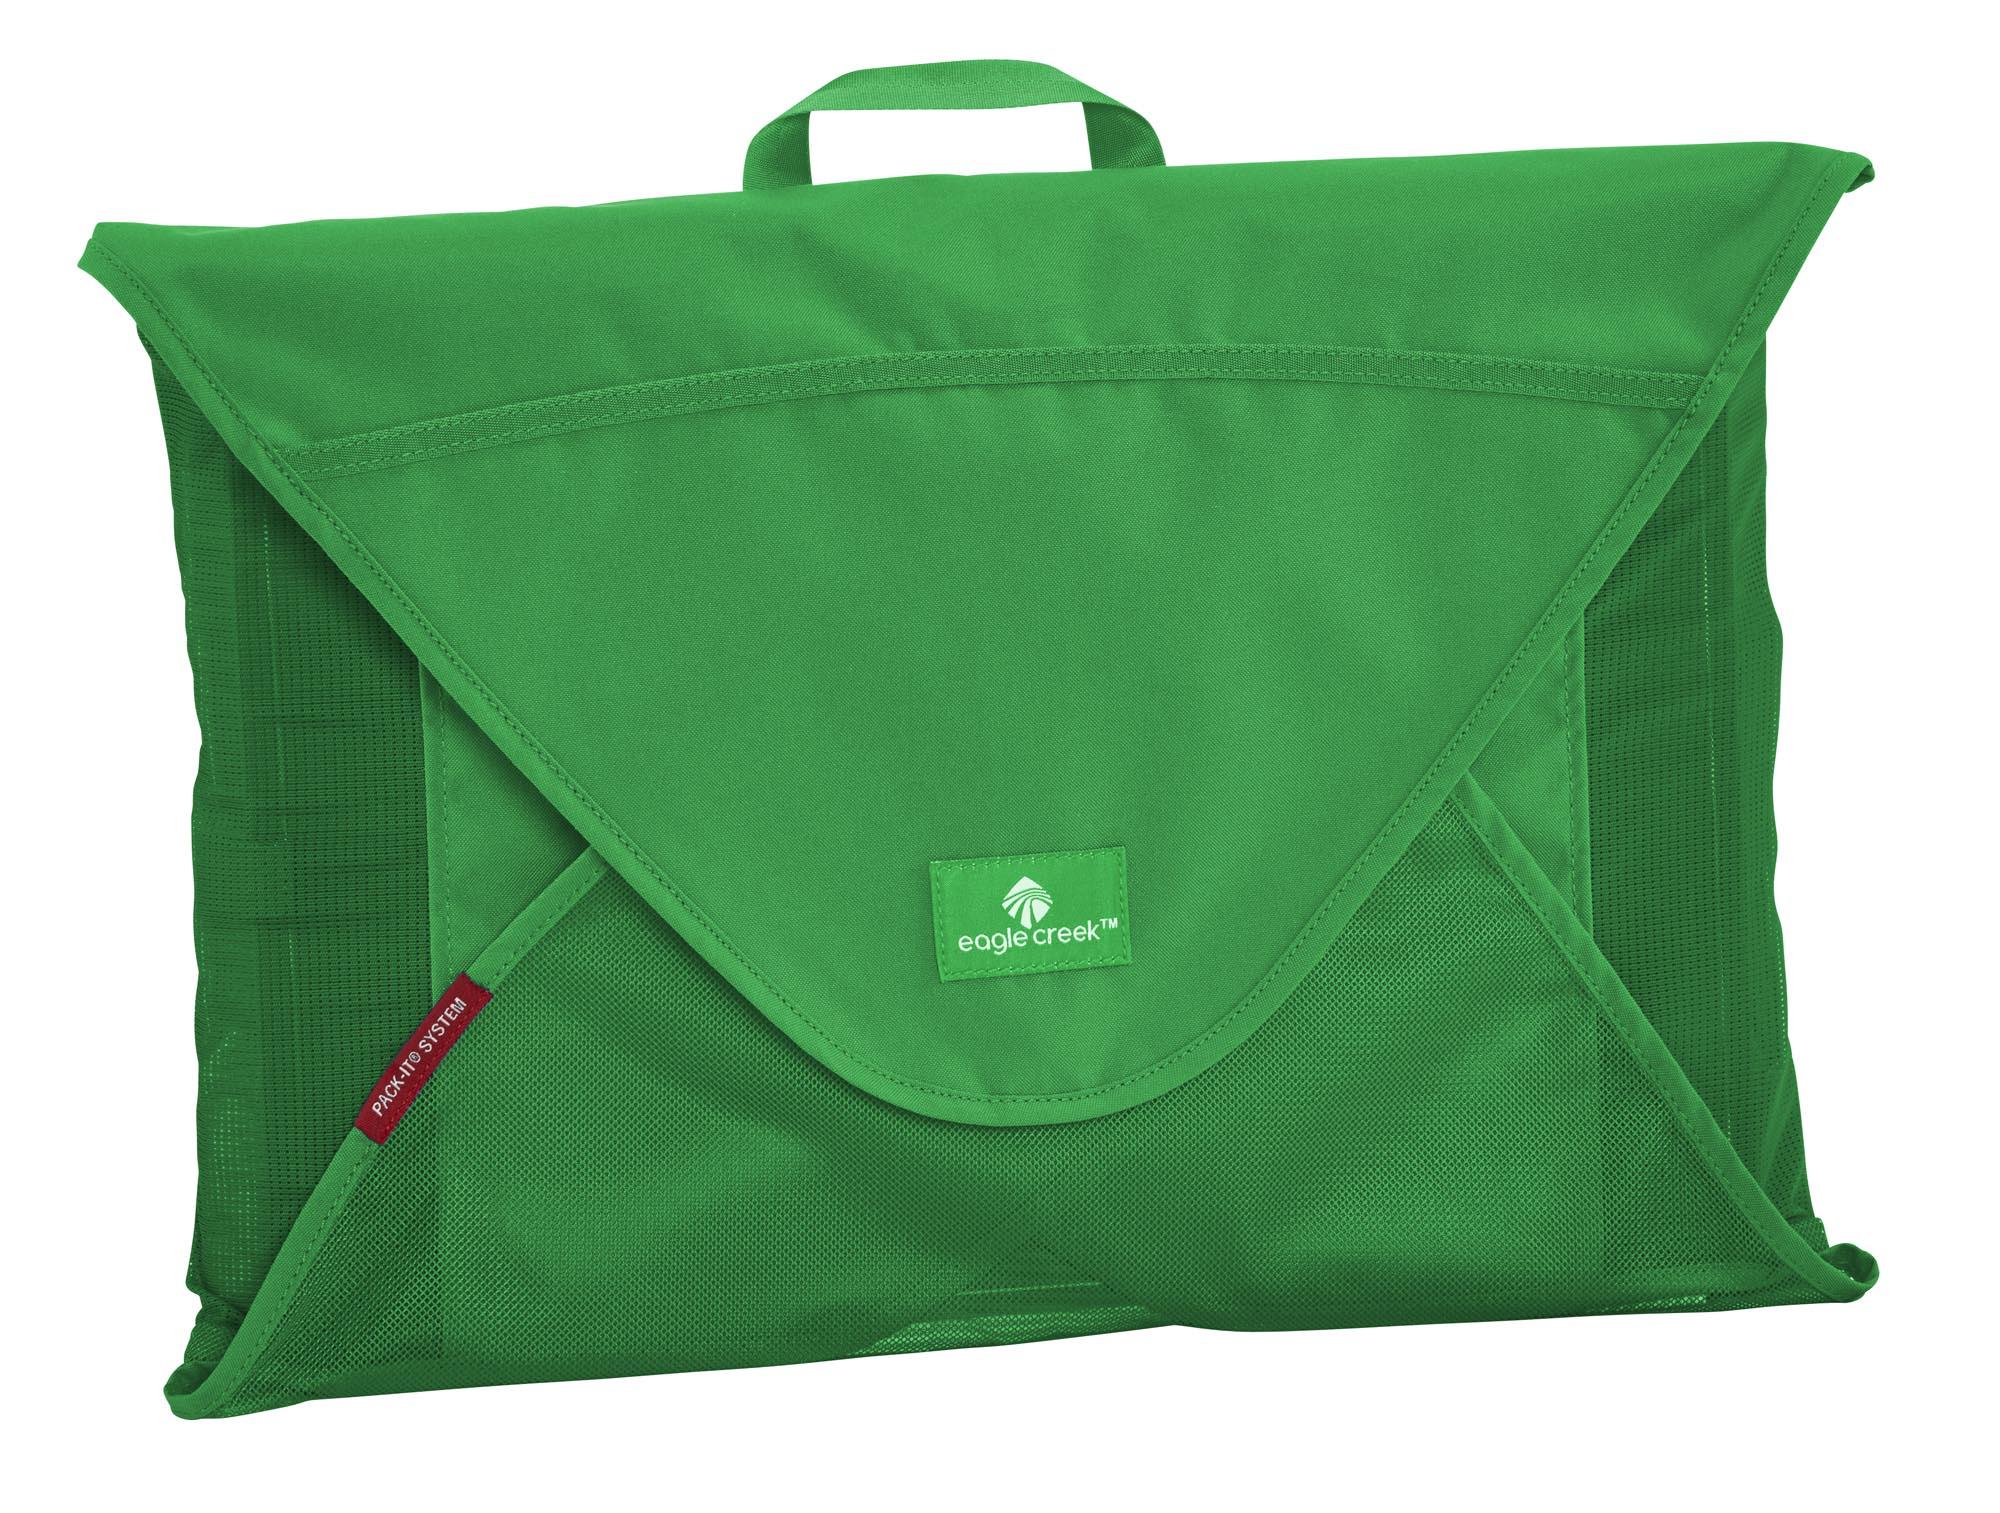 EagleCreek - Pack-It Garment Folder Medium Earth Green - Packing Bags -